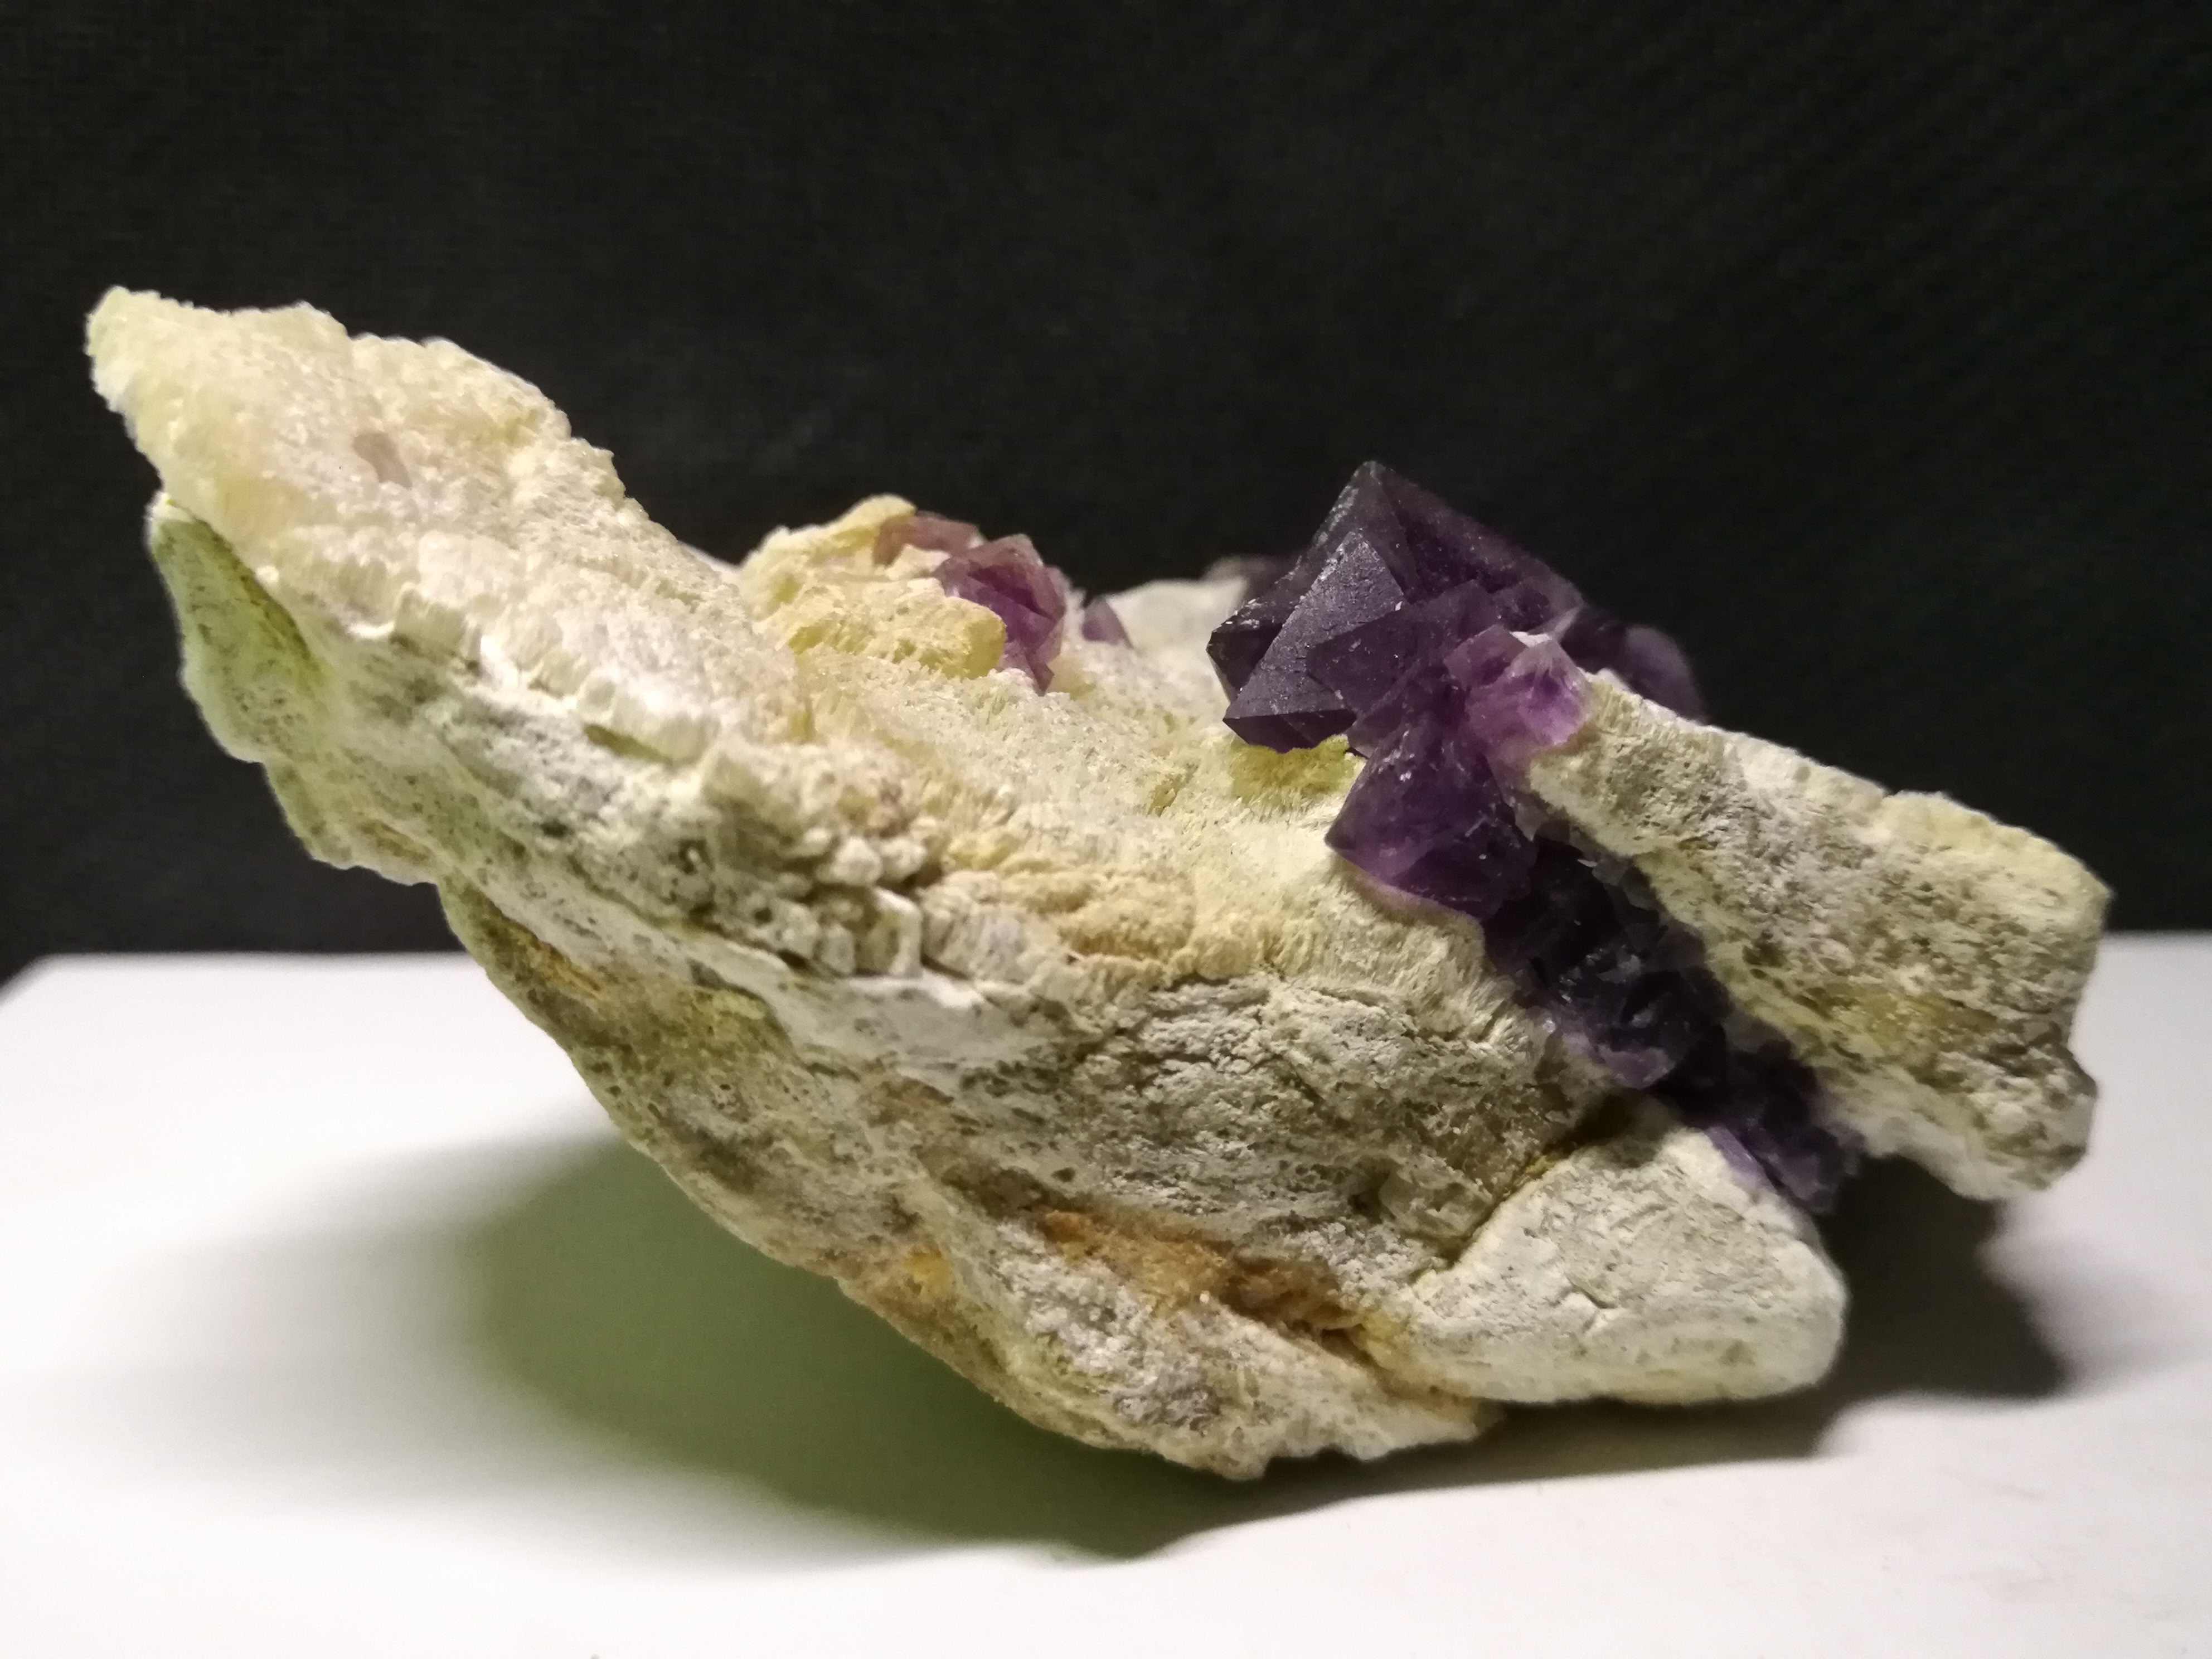 144.2 gnatural roxo fluorite mineral espécime, cristal de quartzo, ornamento da mobília